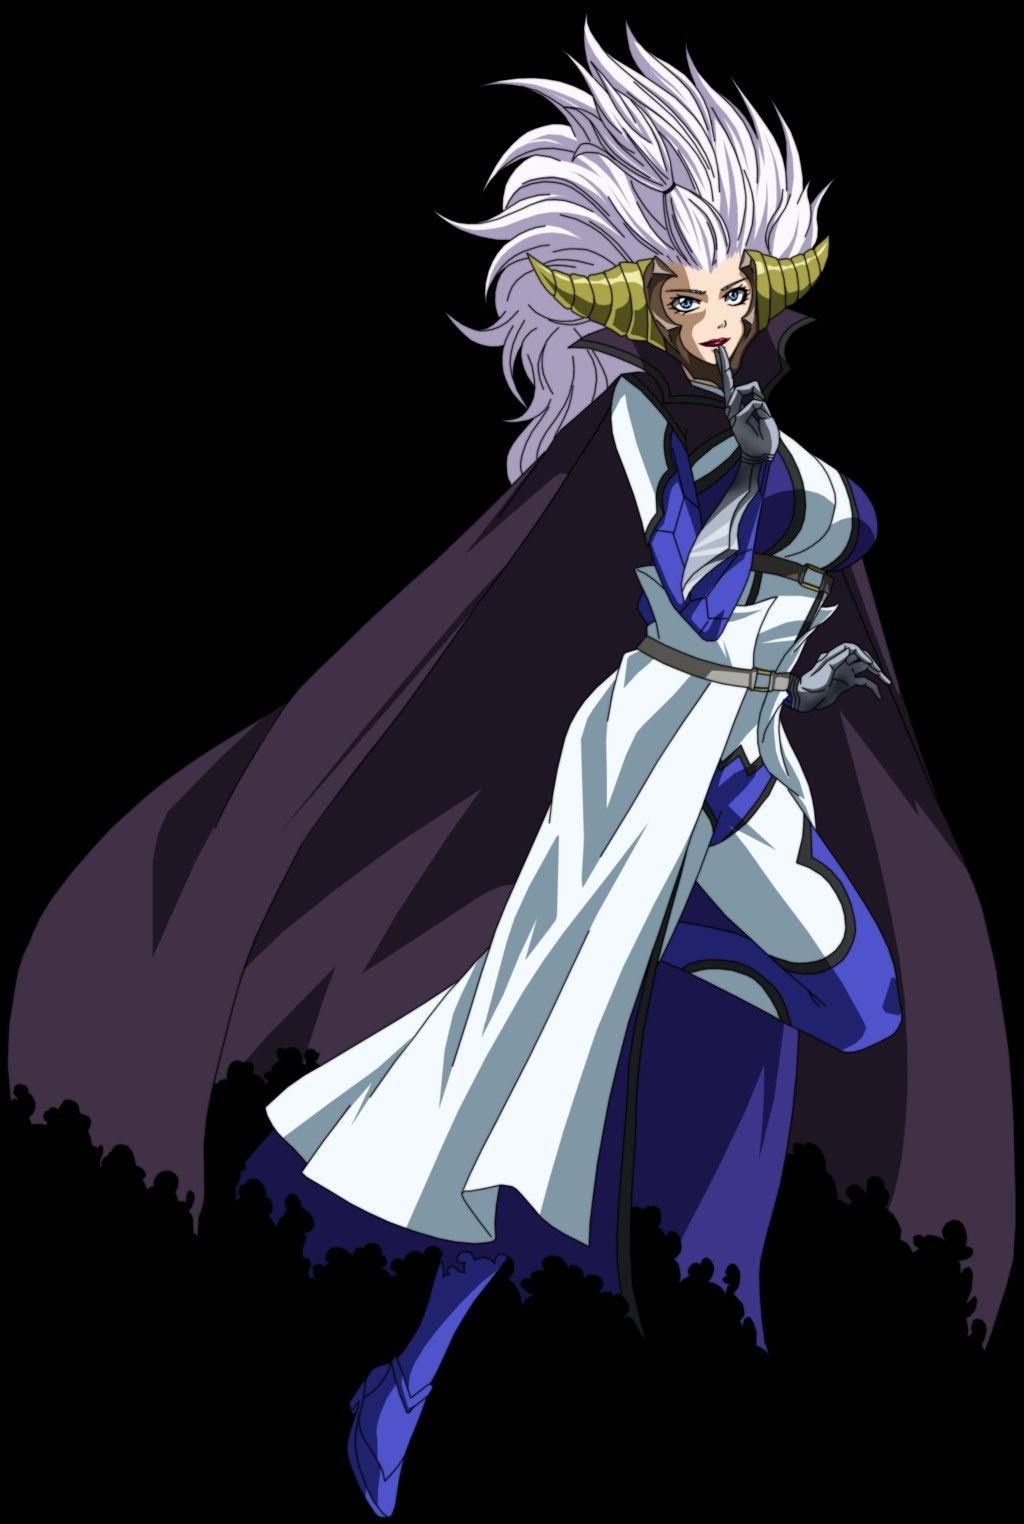 Mirajane Strauss Take Over Magic Satan Soul Sitri Fairy Tail Fairy Tail Anime Fairy Tail Characters Mirajane Fairy Tail The twelfth spirit is sitri. mirajane strauss take over magic satan